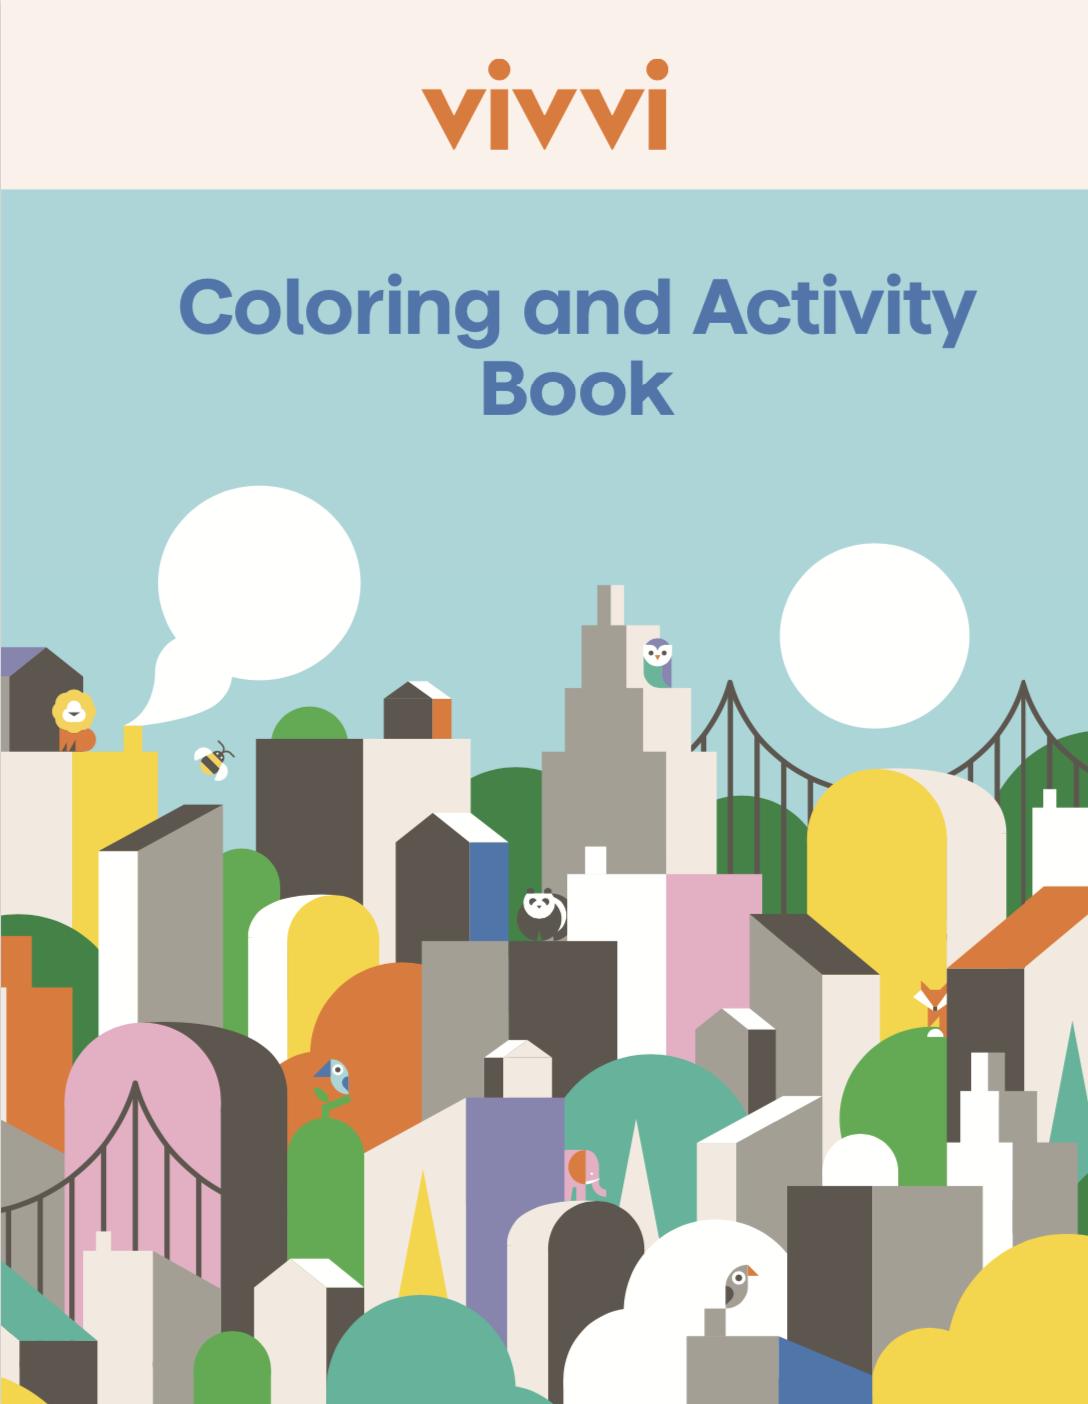 Vivvi Coloring and Activity Book